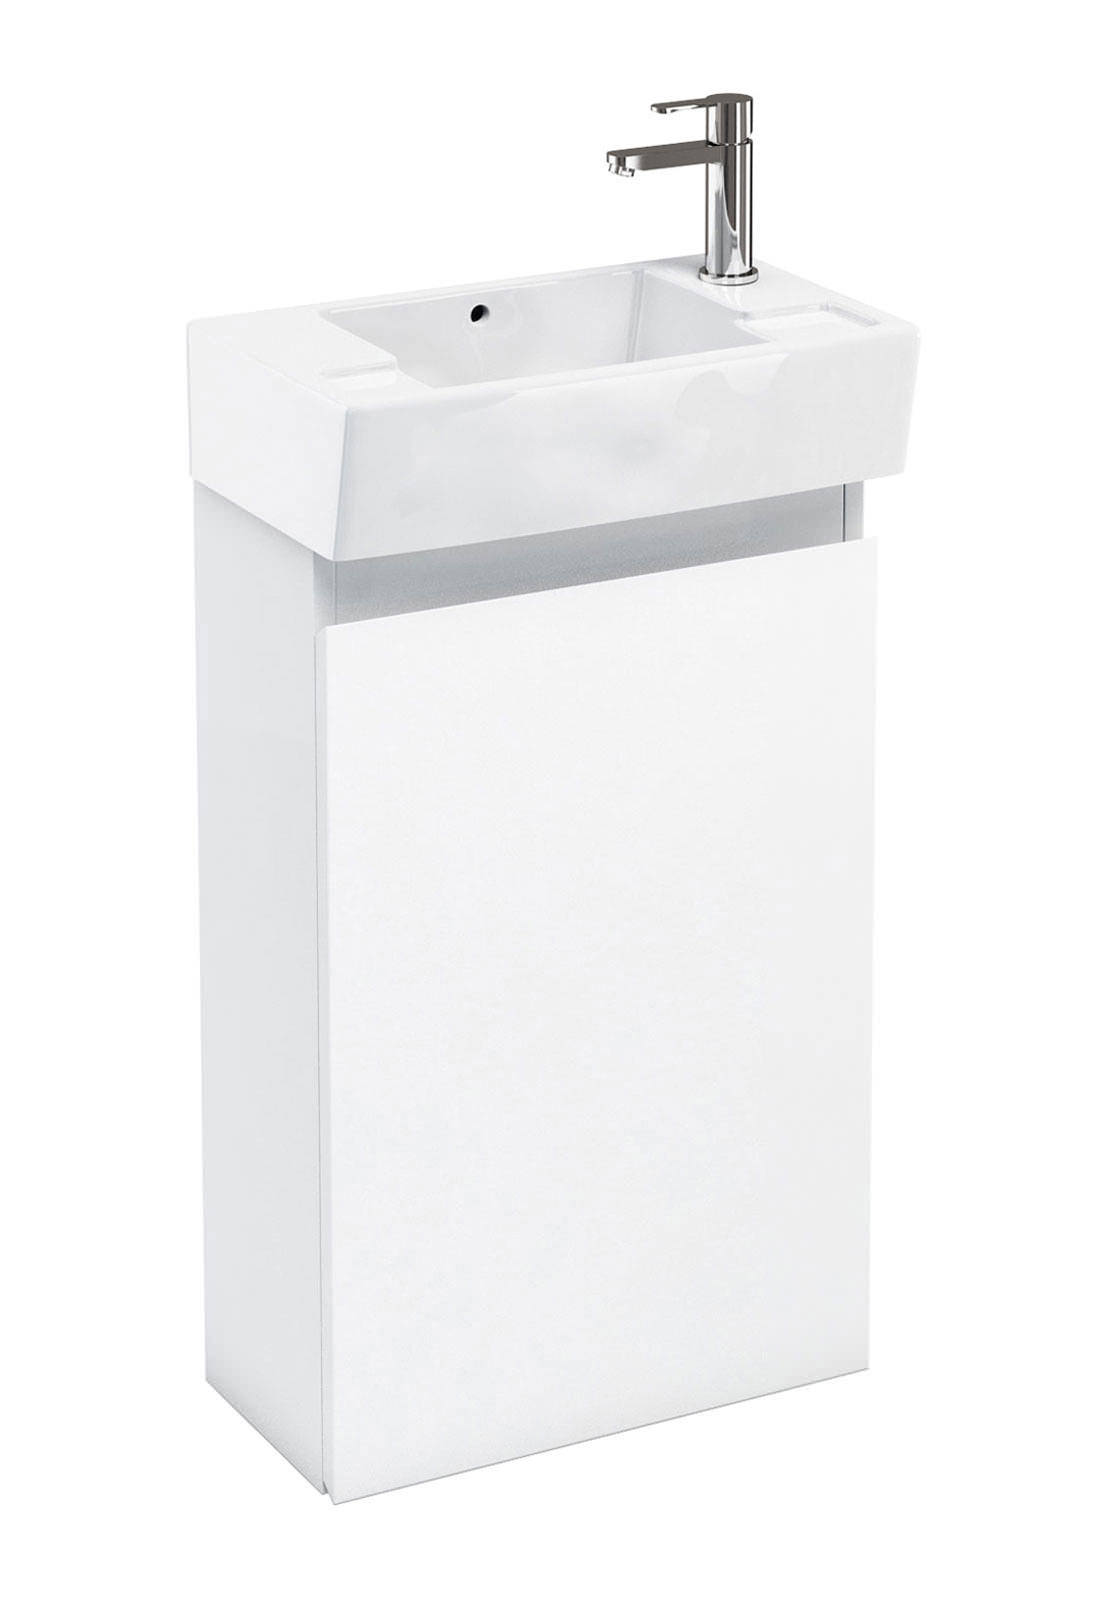 Britton aqua cabinets deep floor standing unit with rh basin for 10 deep floor cabinet